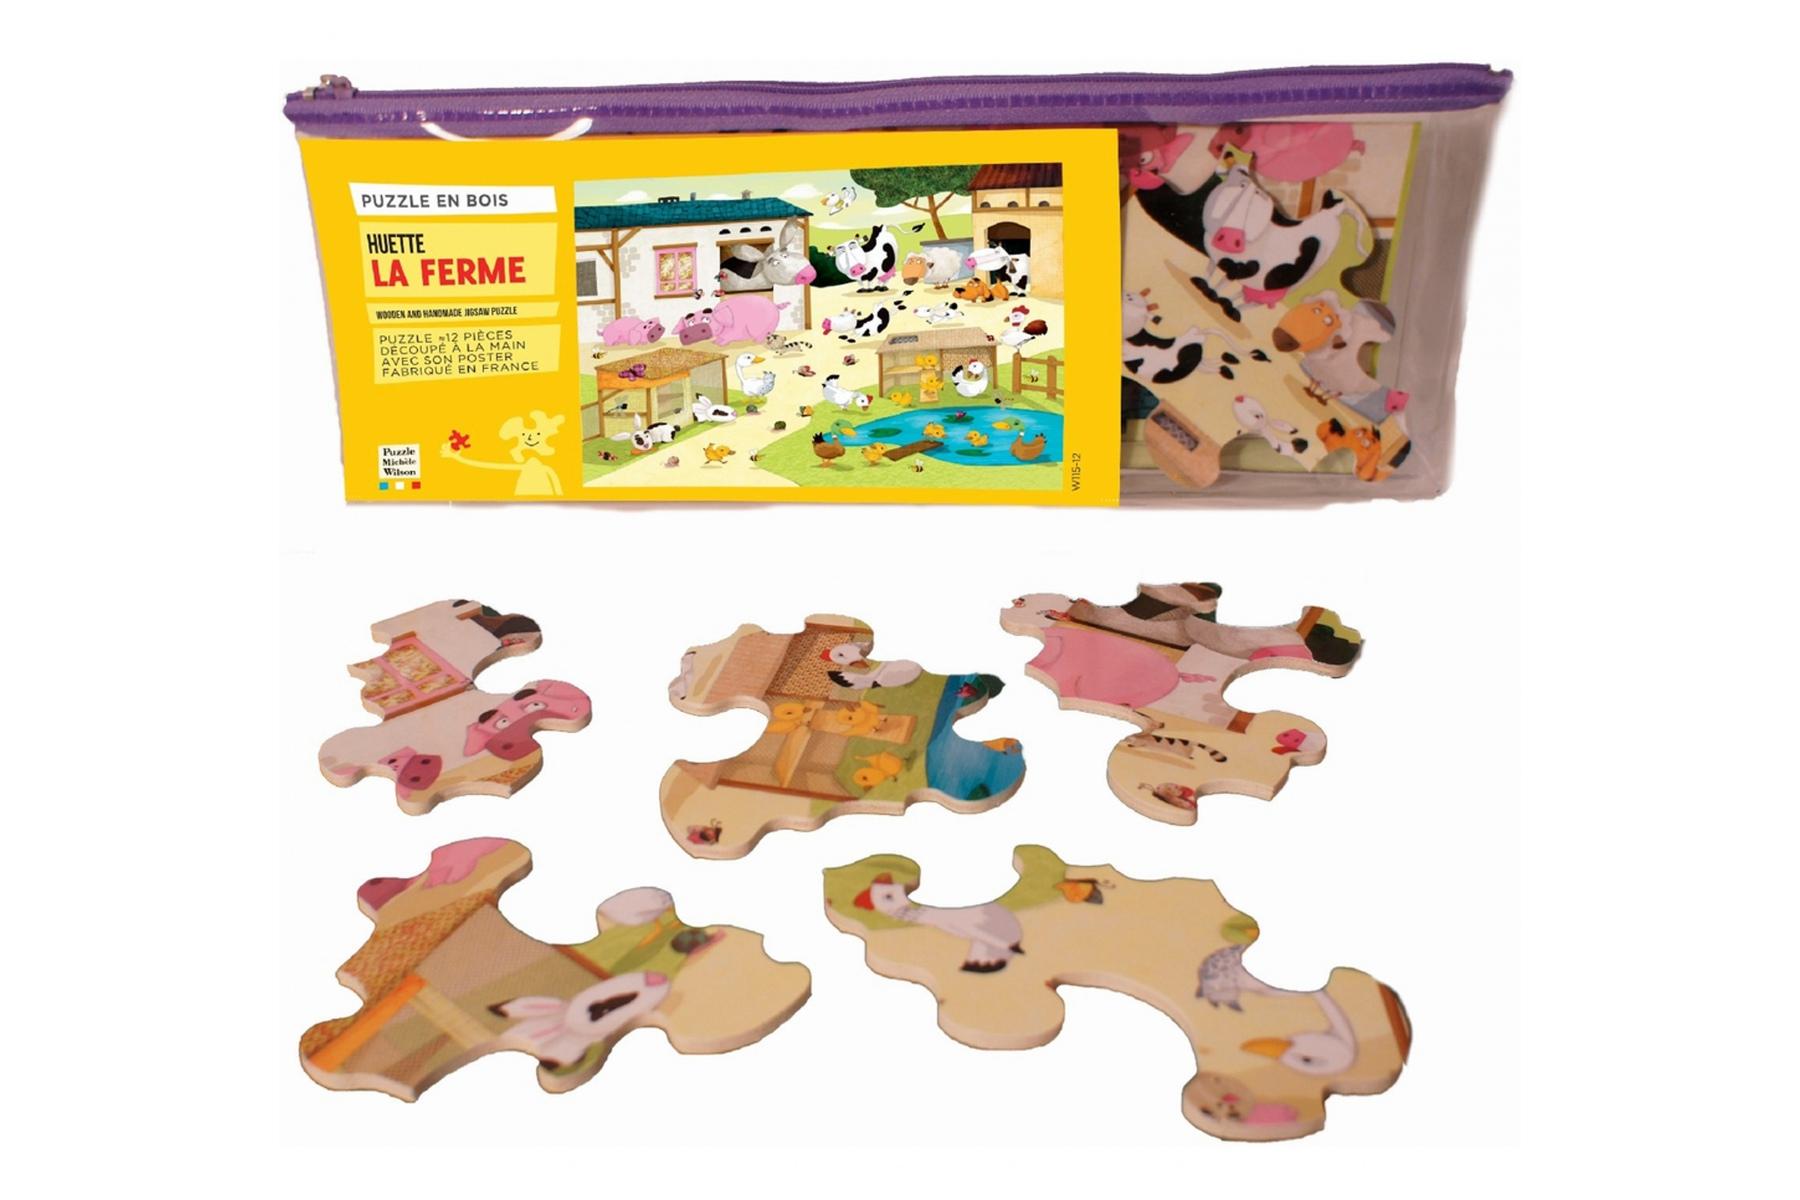 puzzle en bois la ferme puzzle 12 pi ces made in france. Black Bedroom Furniture Sets. Home Design Ideas